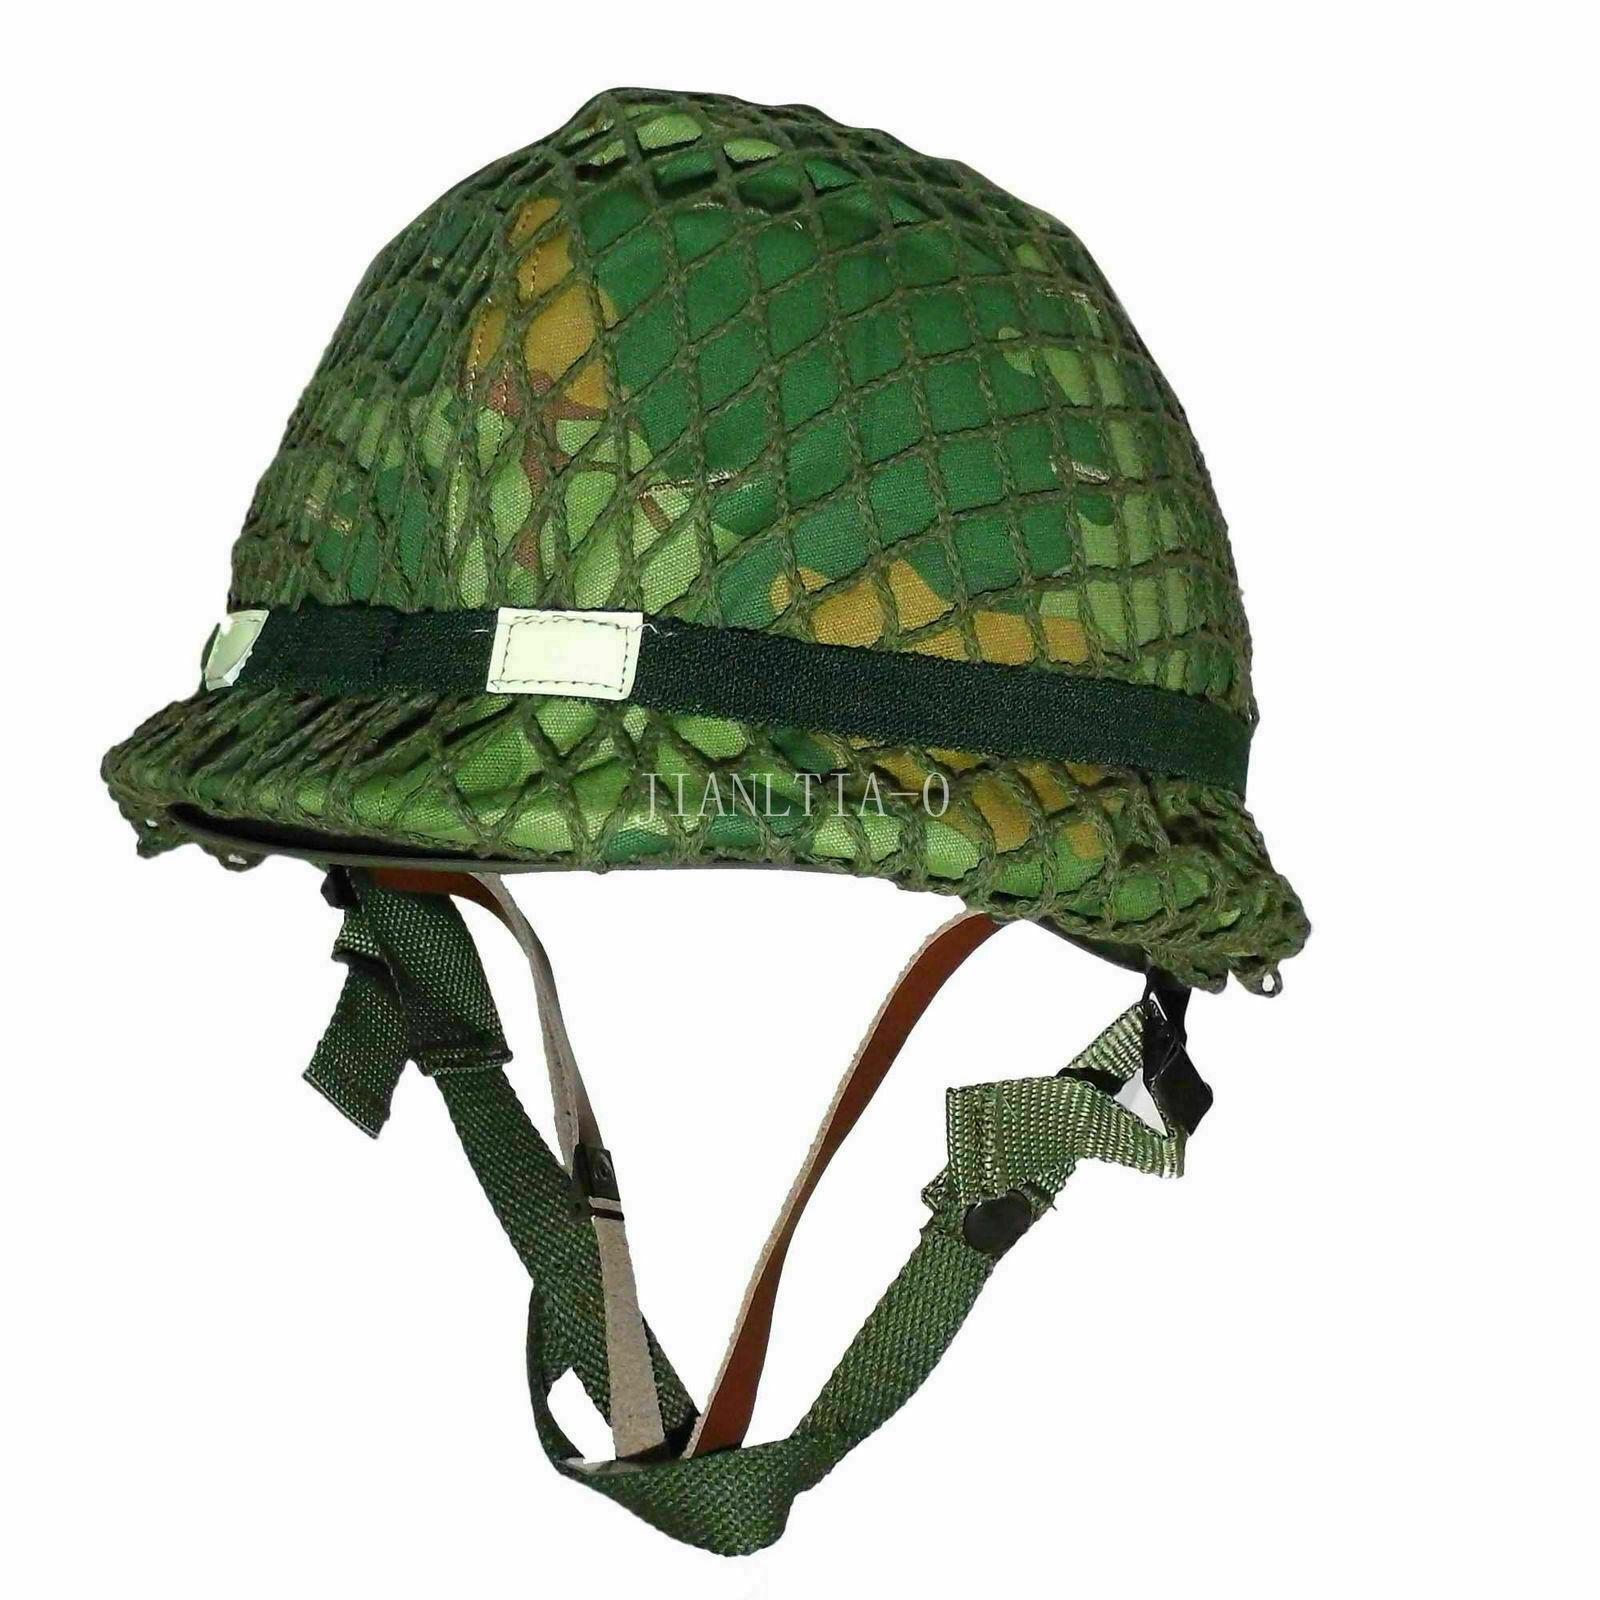 Tomwang2012 Vietnam War Mitchell Camo Us Army M1 Jungle Combat Helmet Military War Reenactments Sports Souvenirs Aliexpress